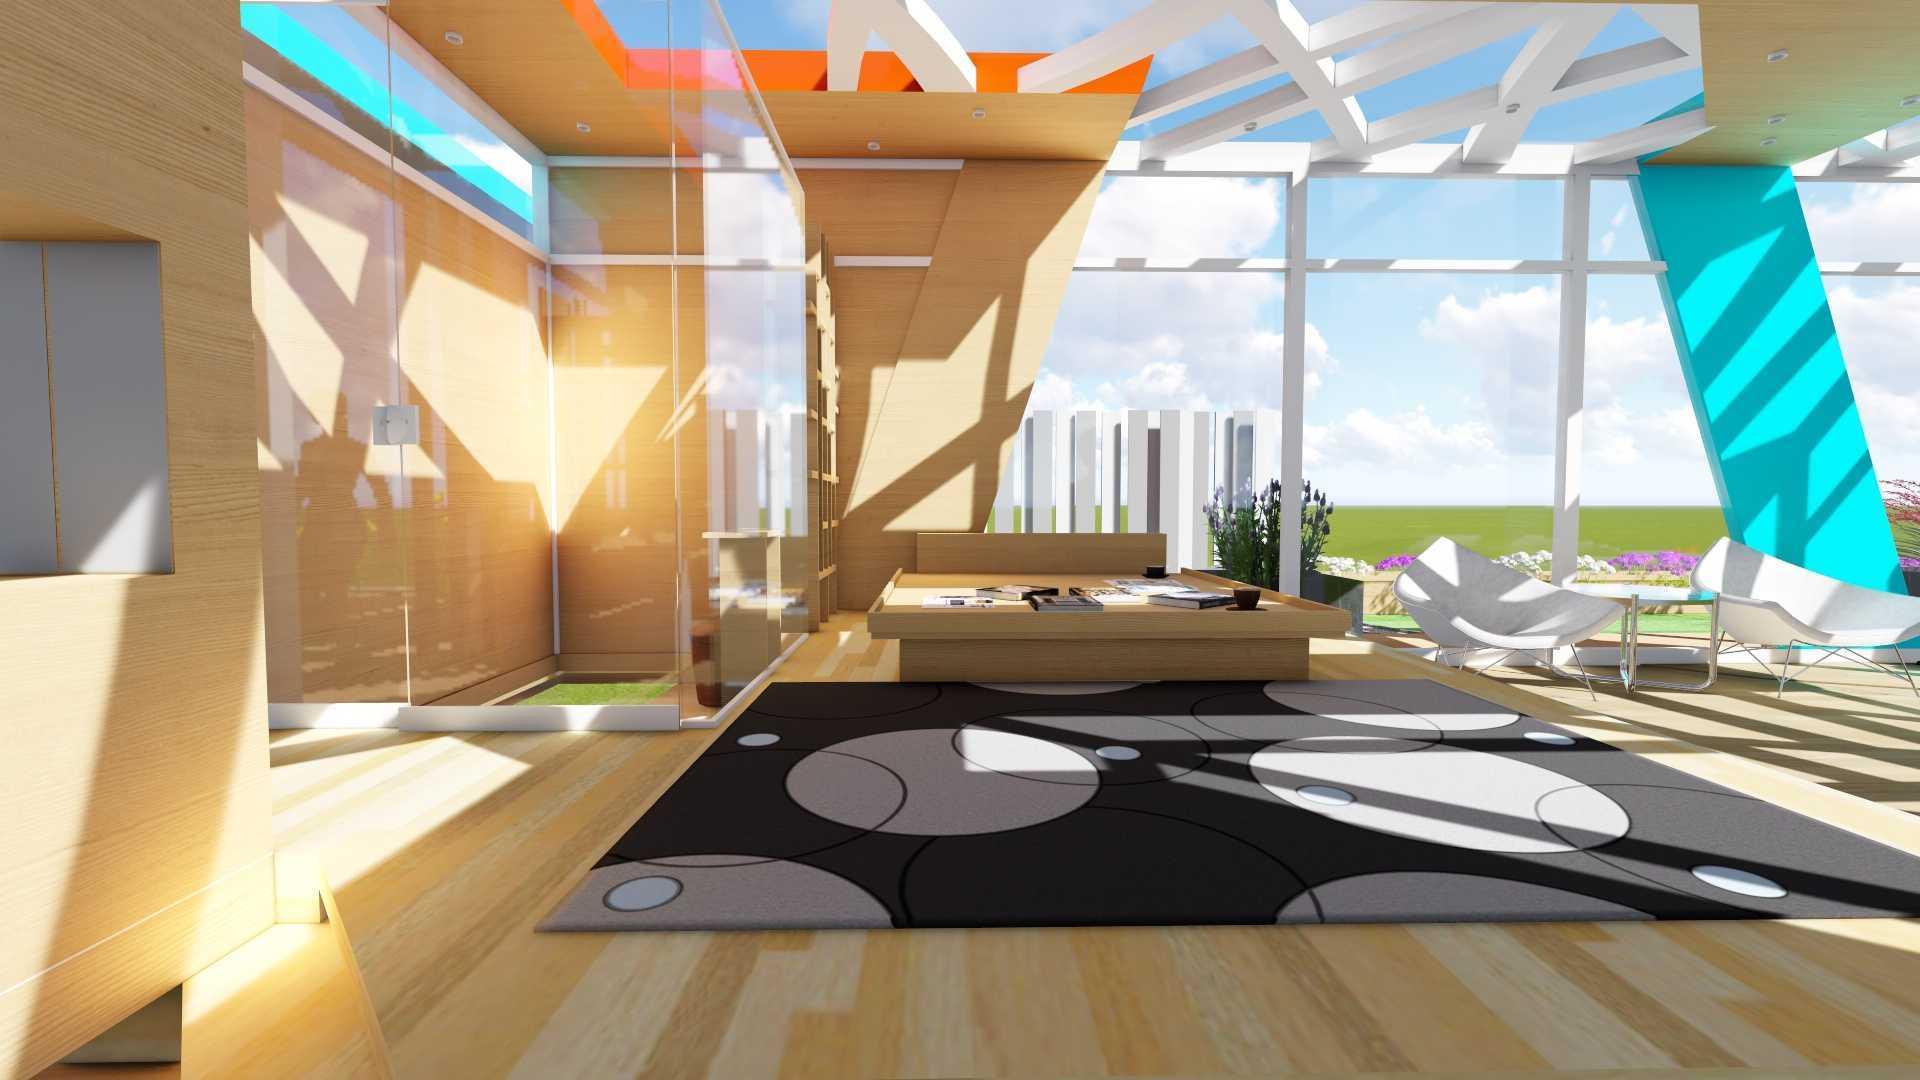 Romy Febrianto Studio Architect Malaysia Malaysia Romy-Febrianto-Studio-Architect   68424